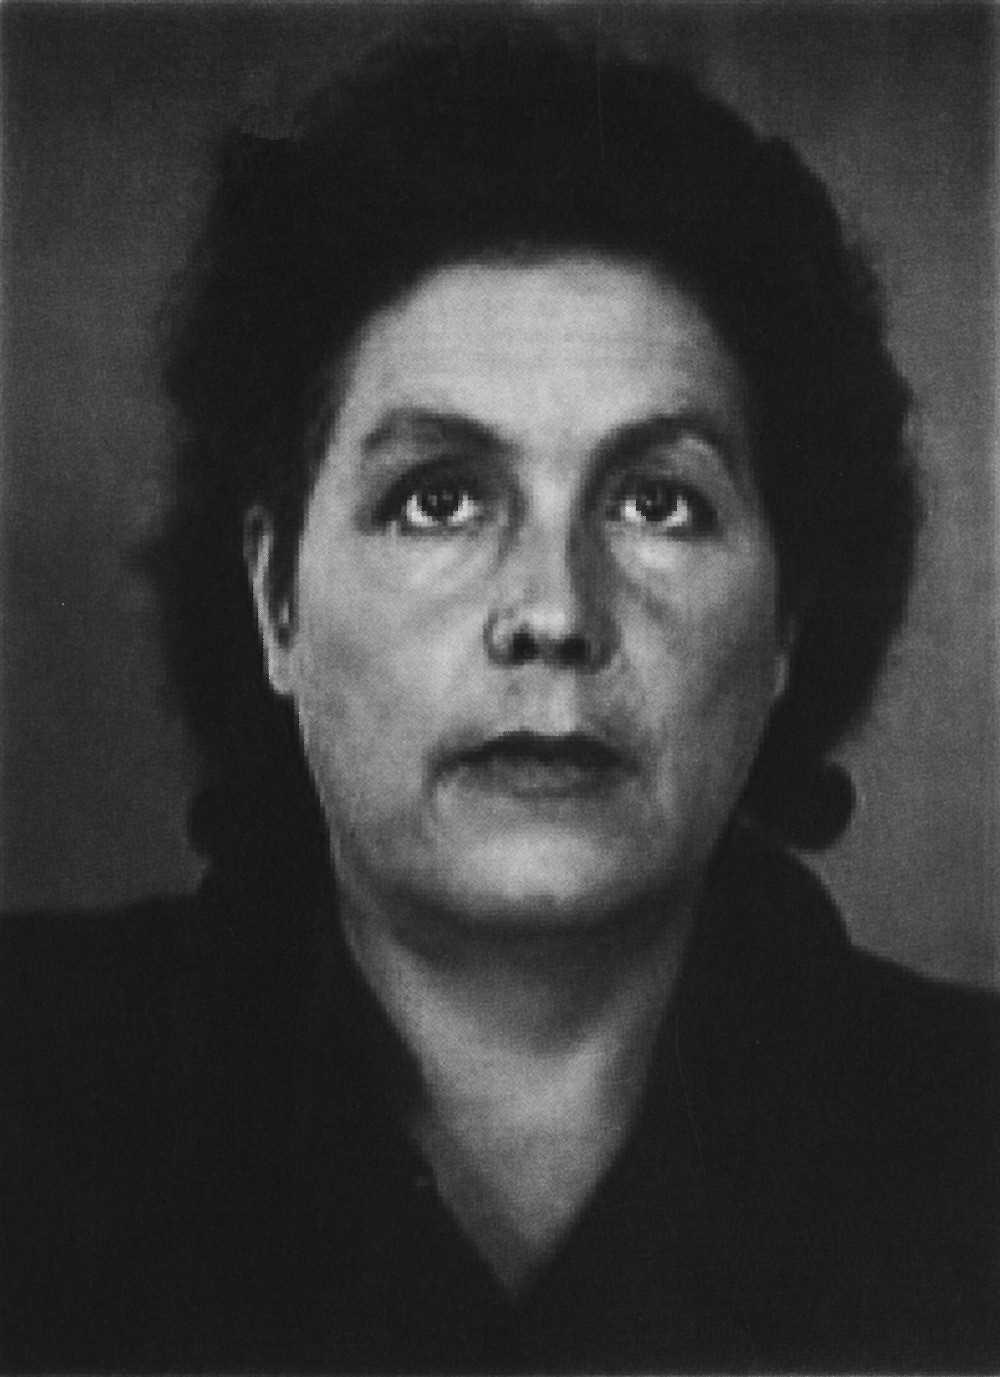 Fosca Corsinovi a la Colònia Infantil «L'Adunata dei Refrattari» (22 de gener de 1936)